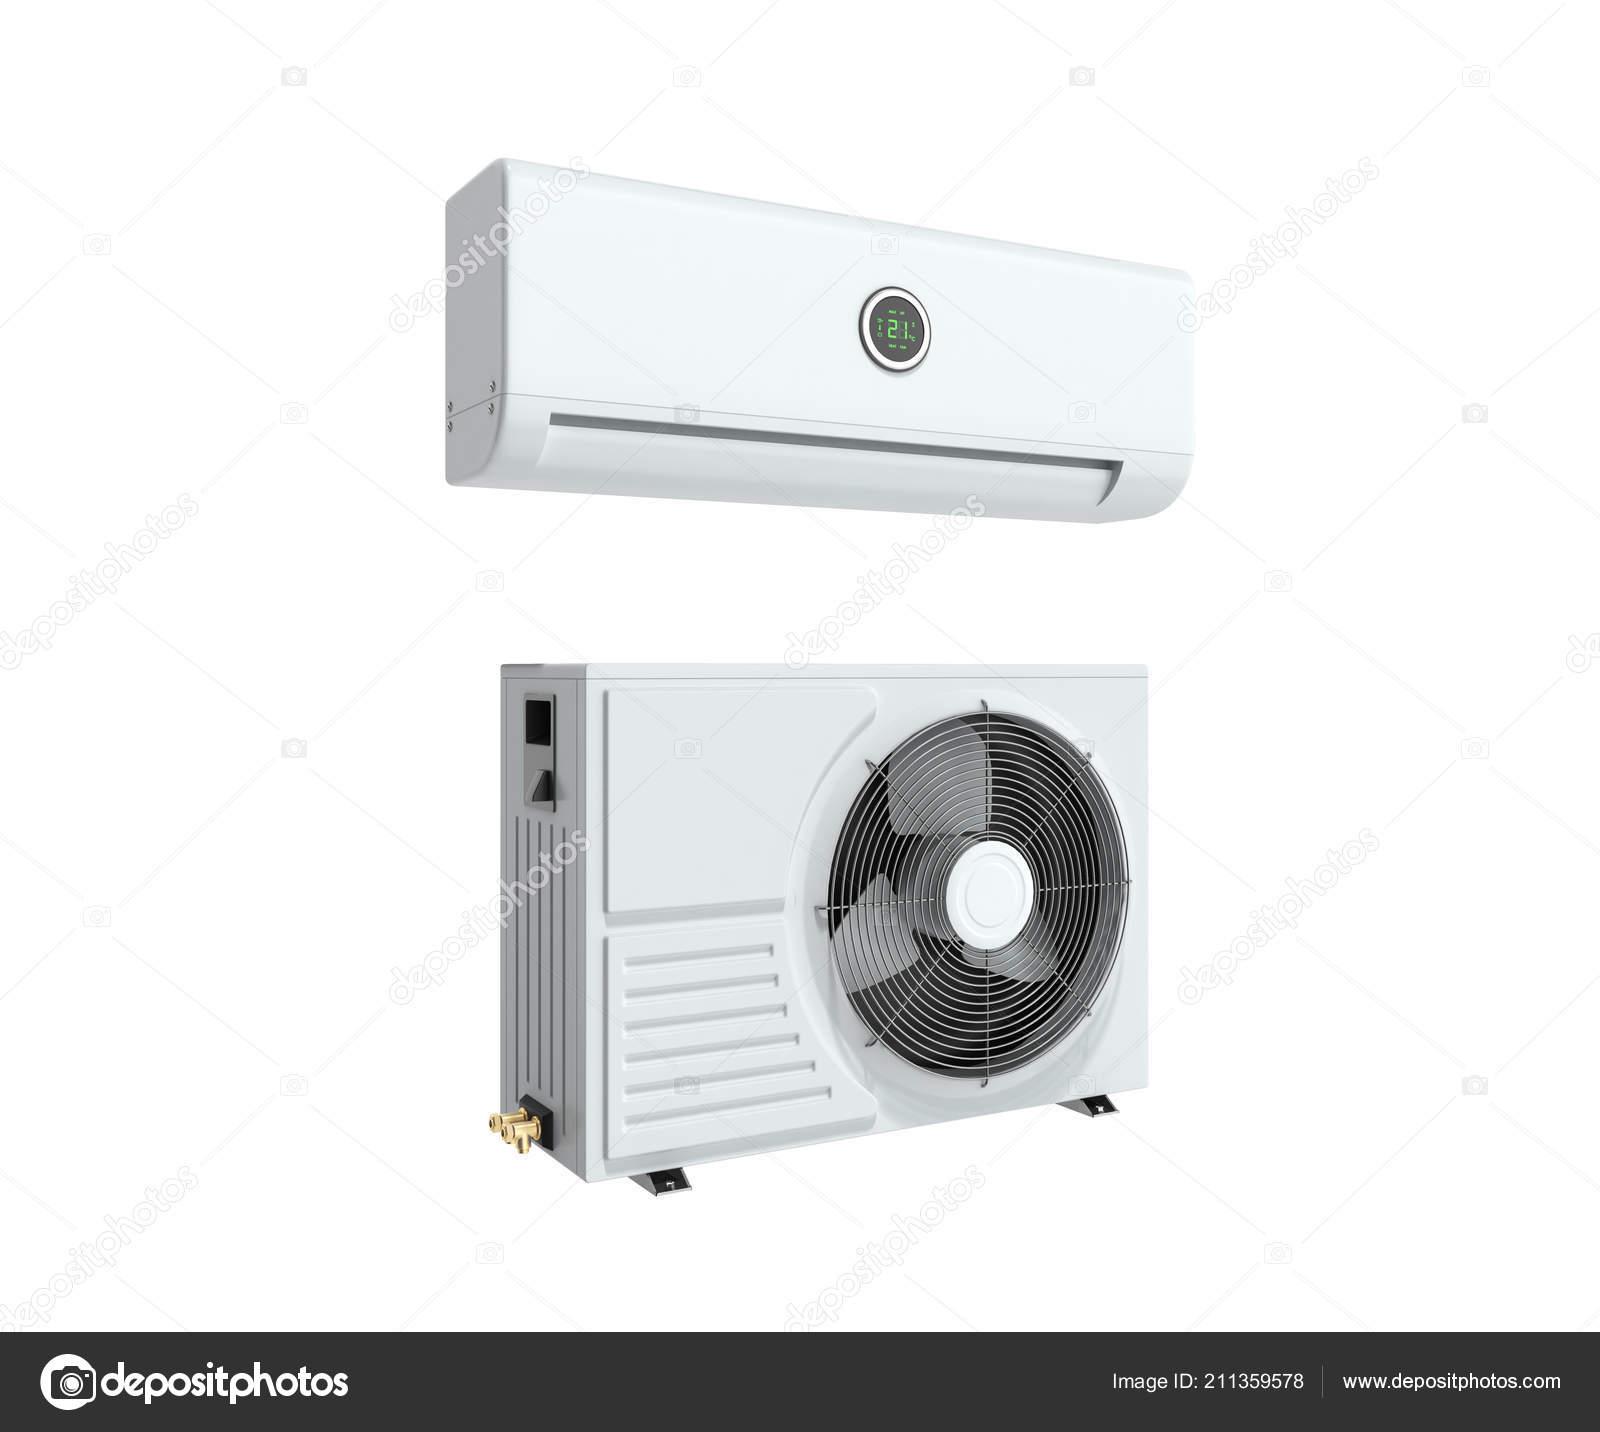 Download 54 Koleksi Background Of Air Conditioning HD Terbaru